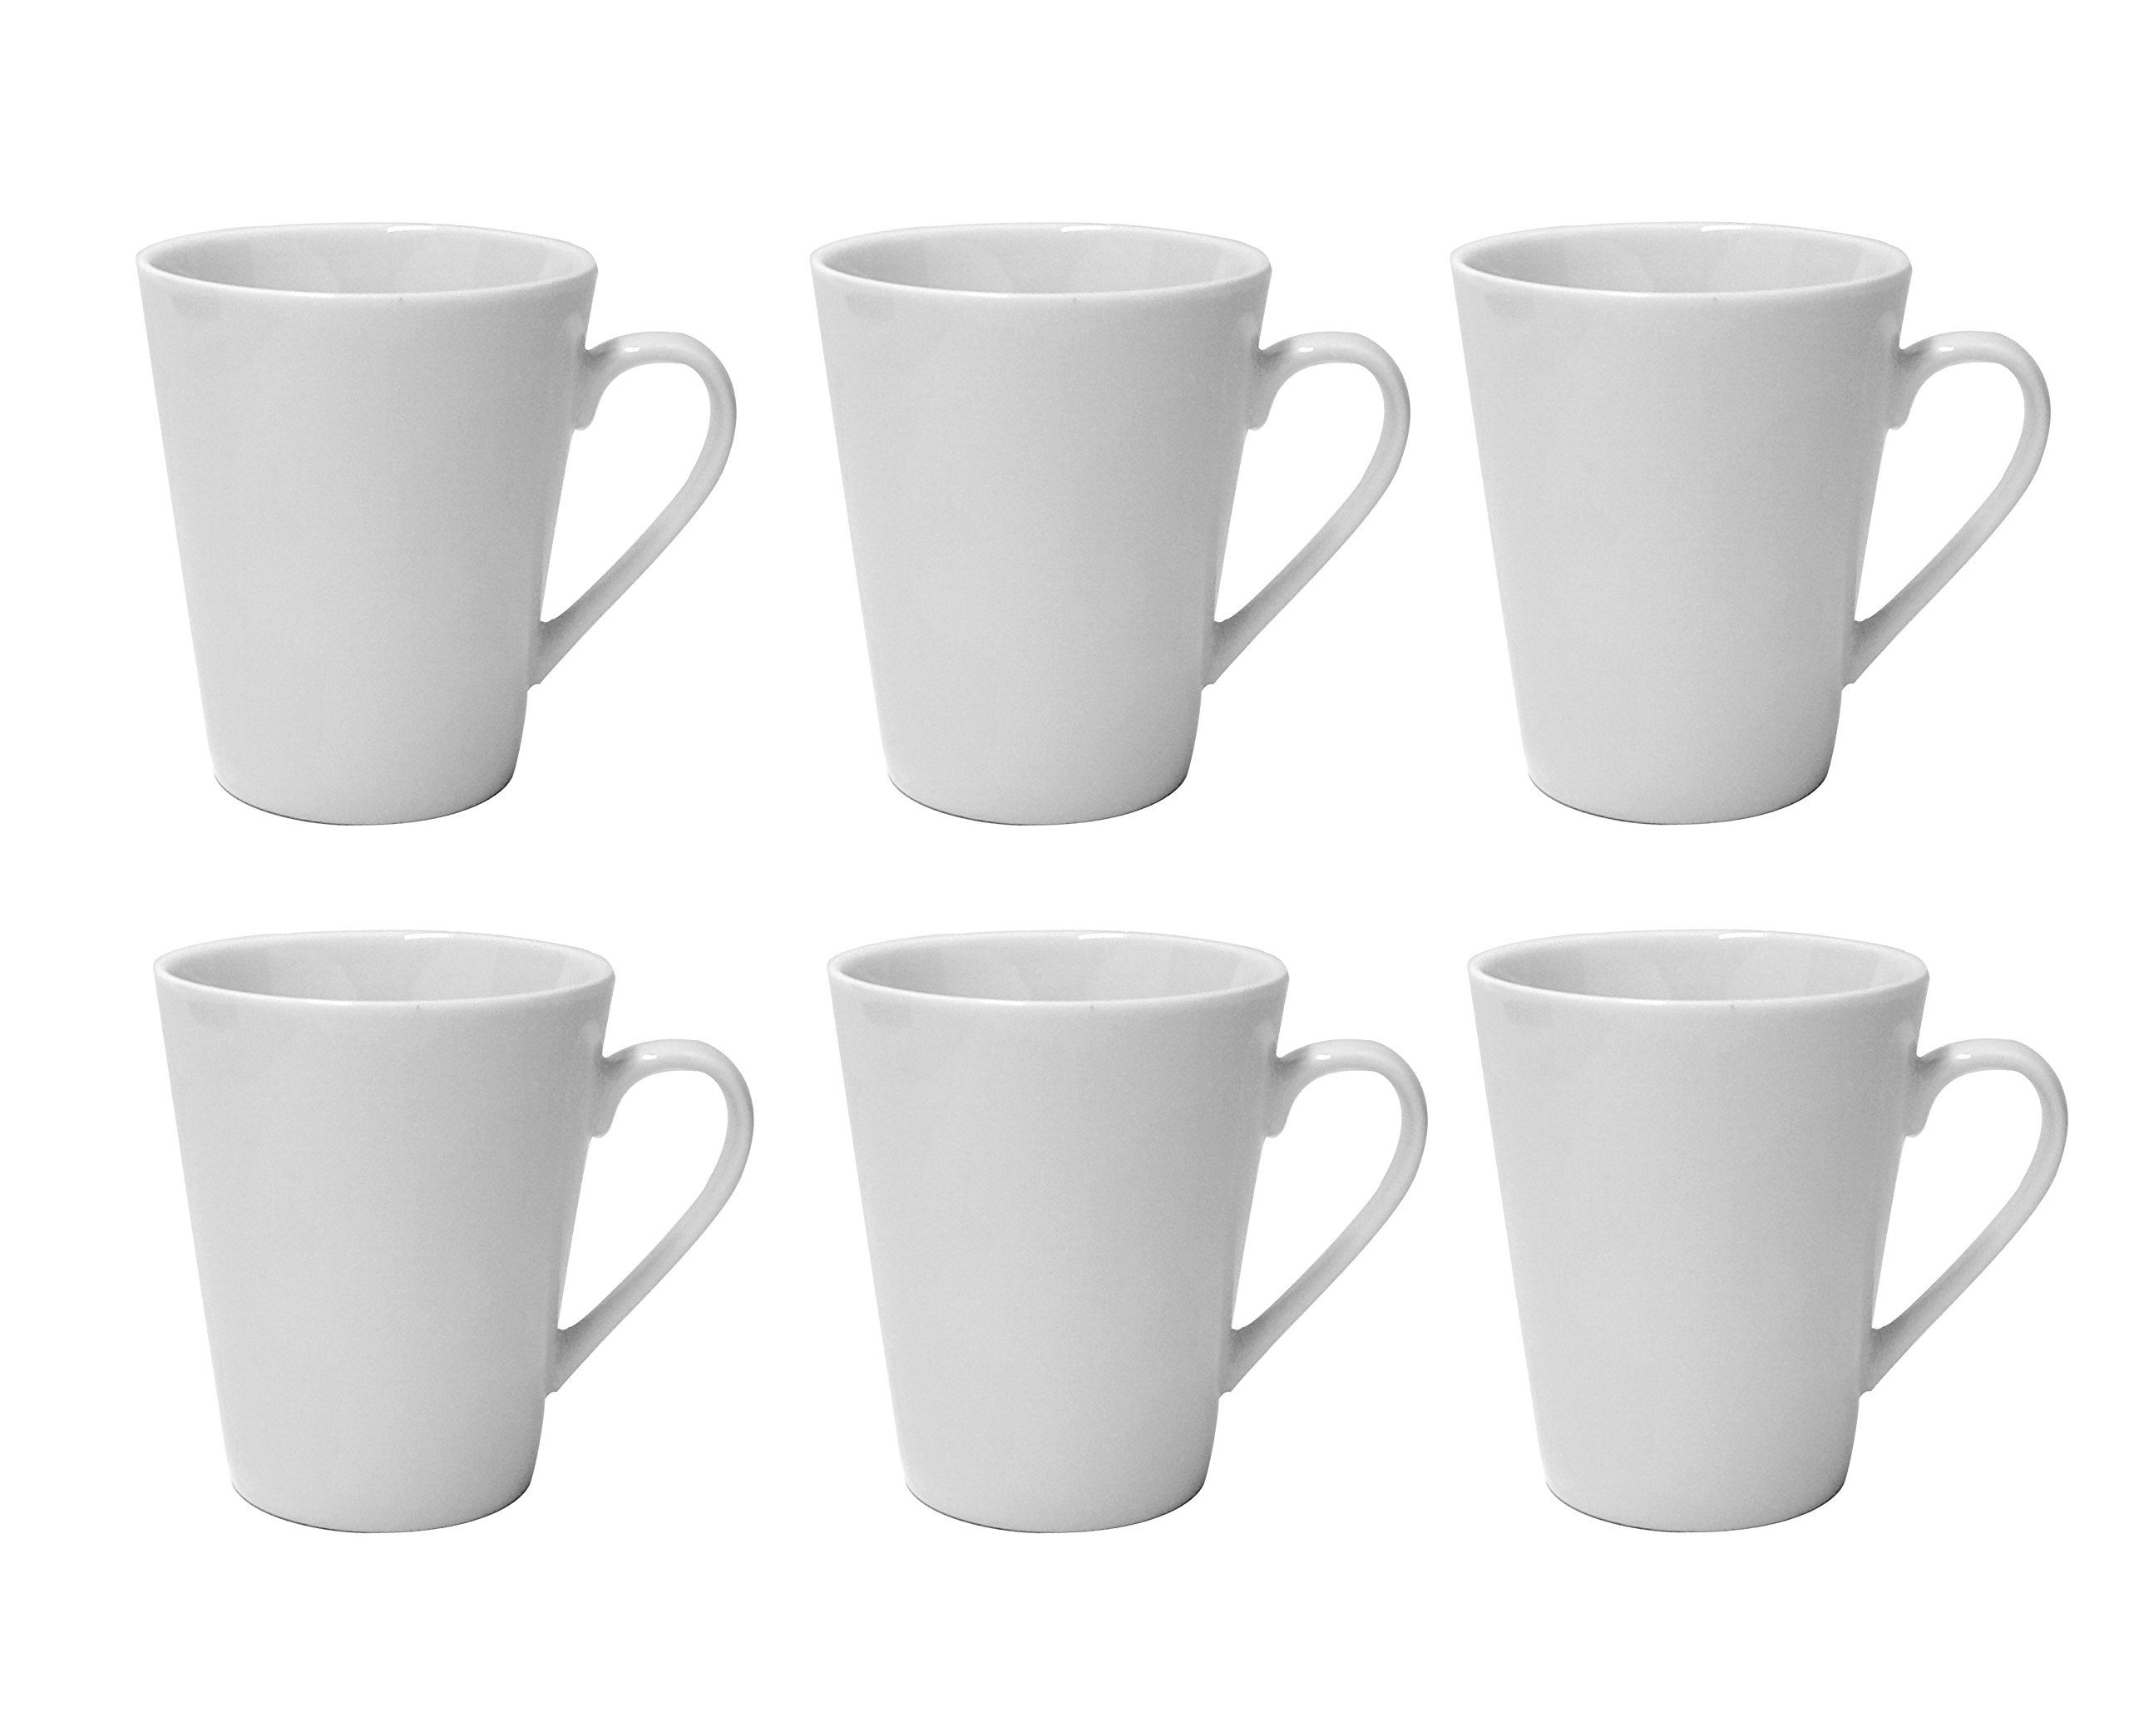 LEANDALE Plain White 10 OZ Ceramic Cup set,Coffee Mug Set (White-6 pcs)